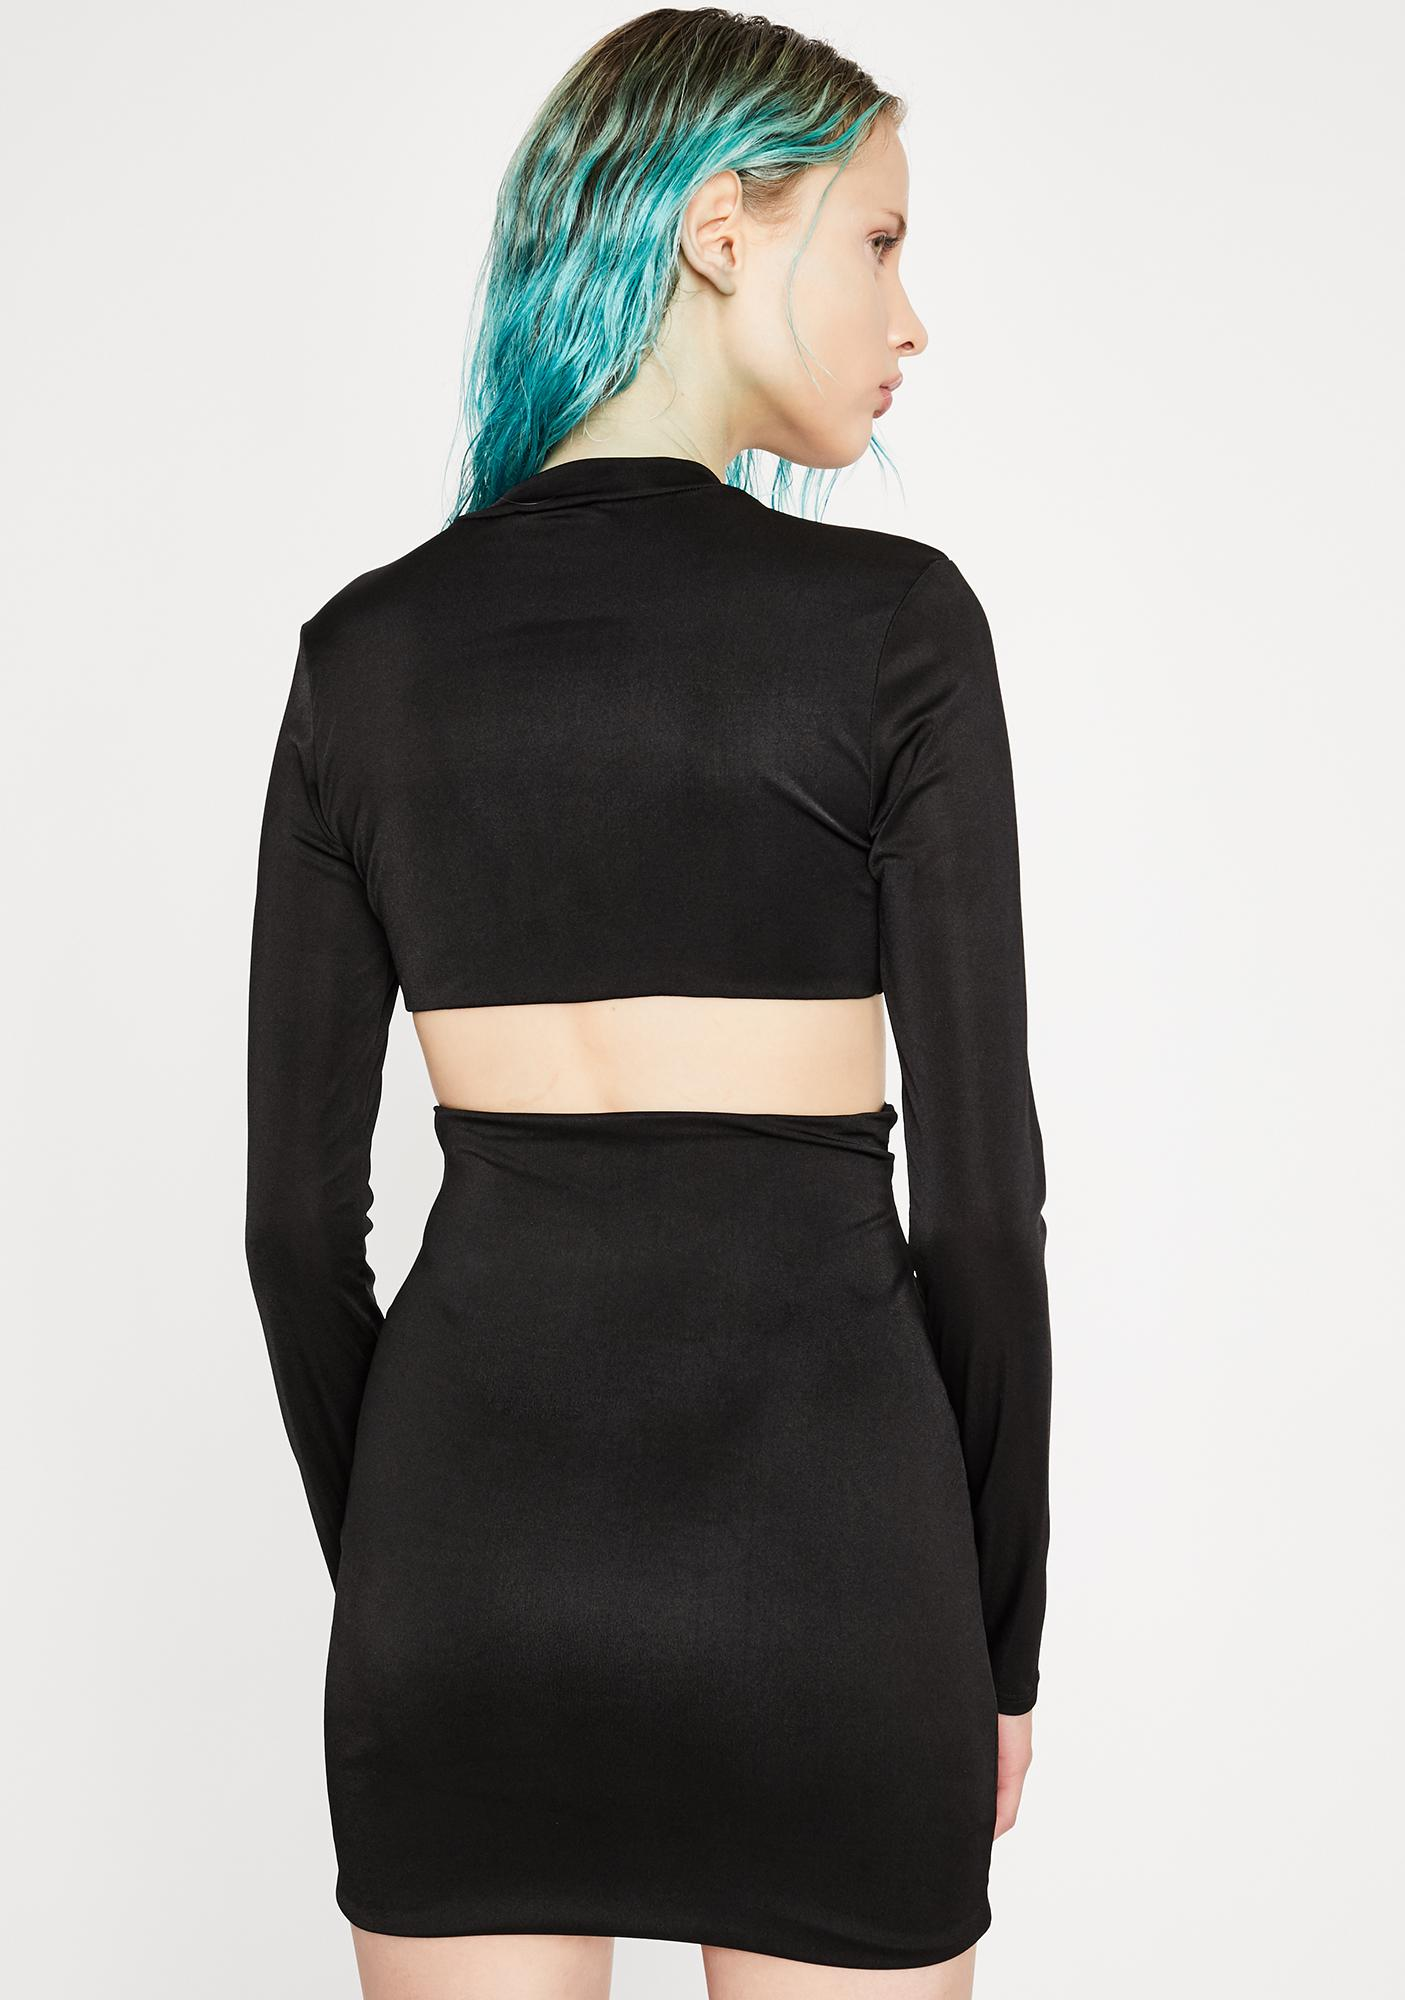 Sneak Peek Cut-Out Dress